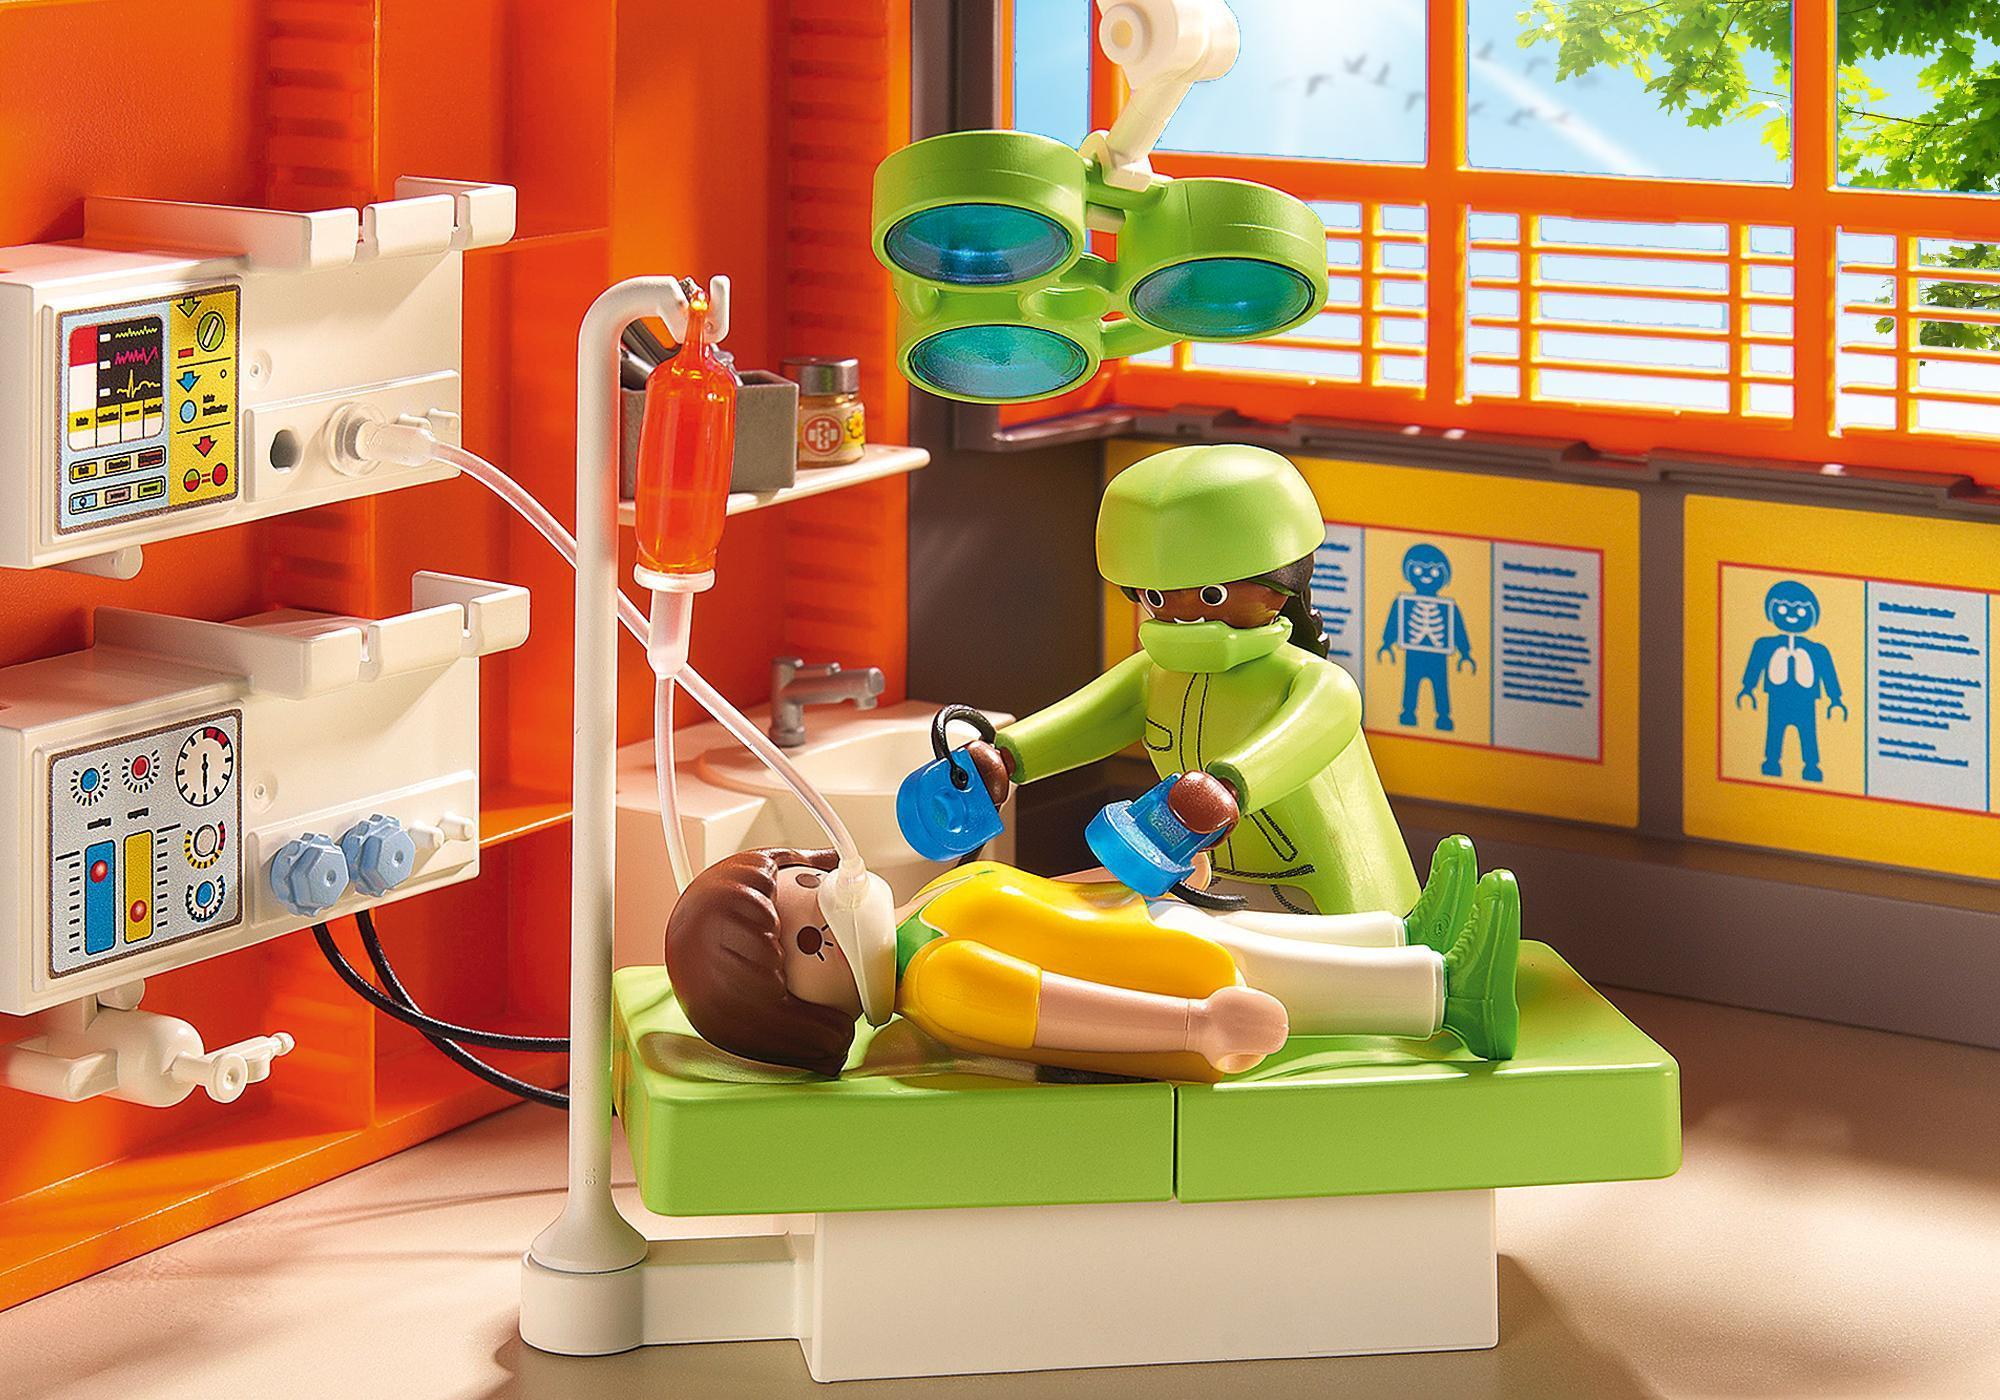 http://media.playmobil.com/i/playmobil/6657_product_extra1/Kinderklinik mit Einrichtung